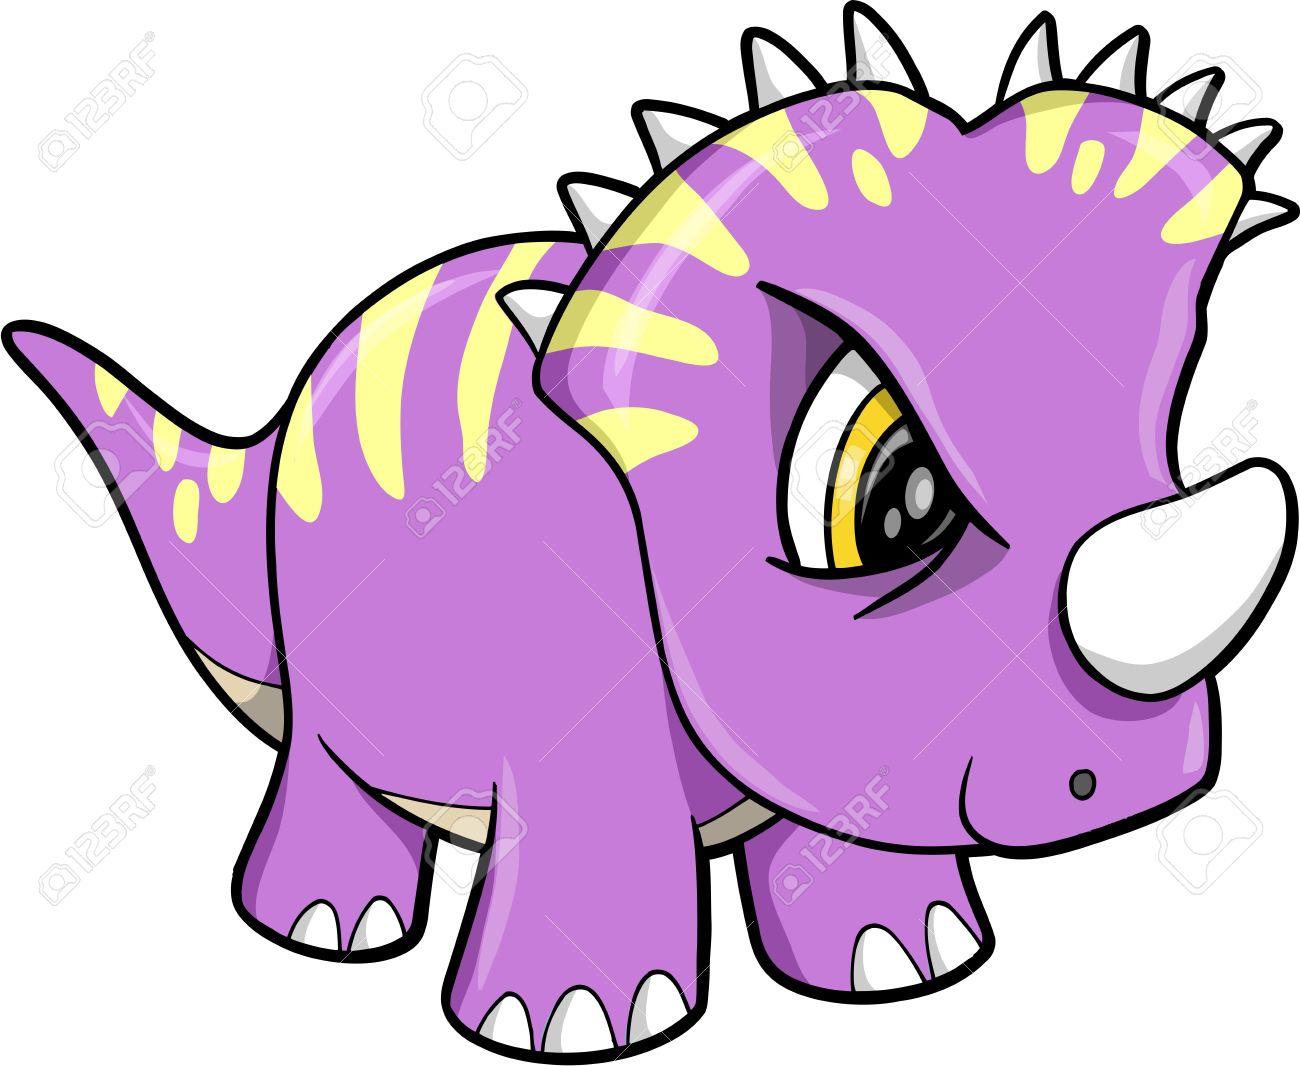 Tough Cute Dinosaur Animal Vector Illustration Art Stock Vector - 12415091